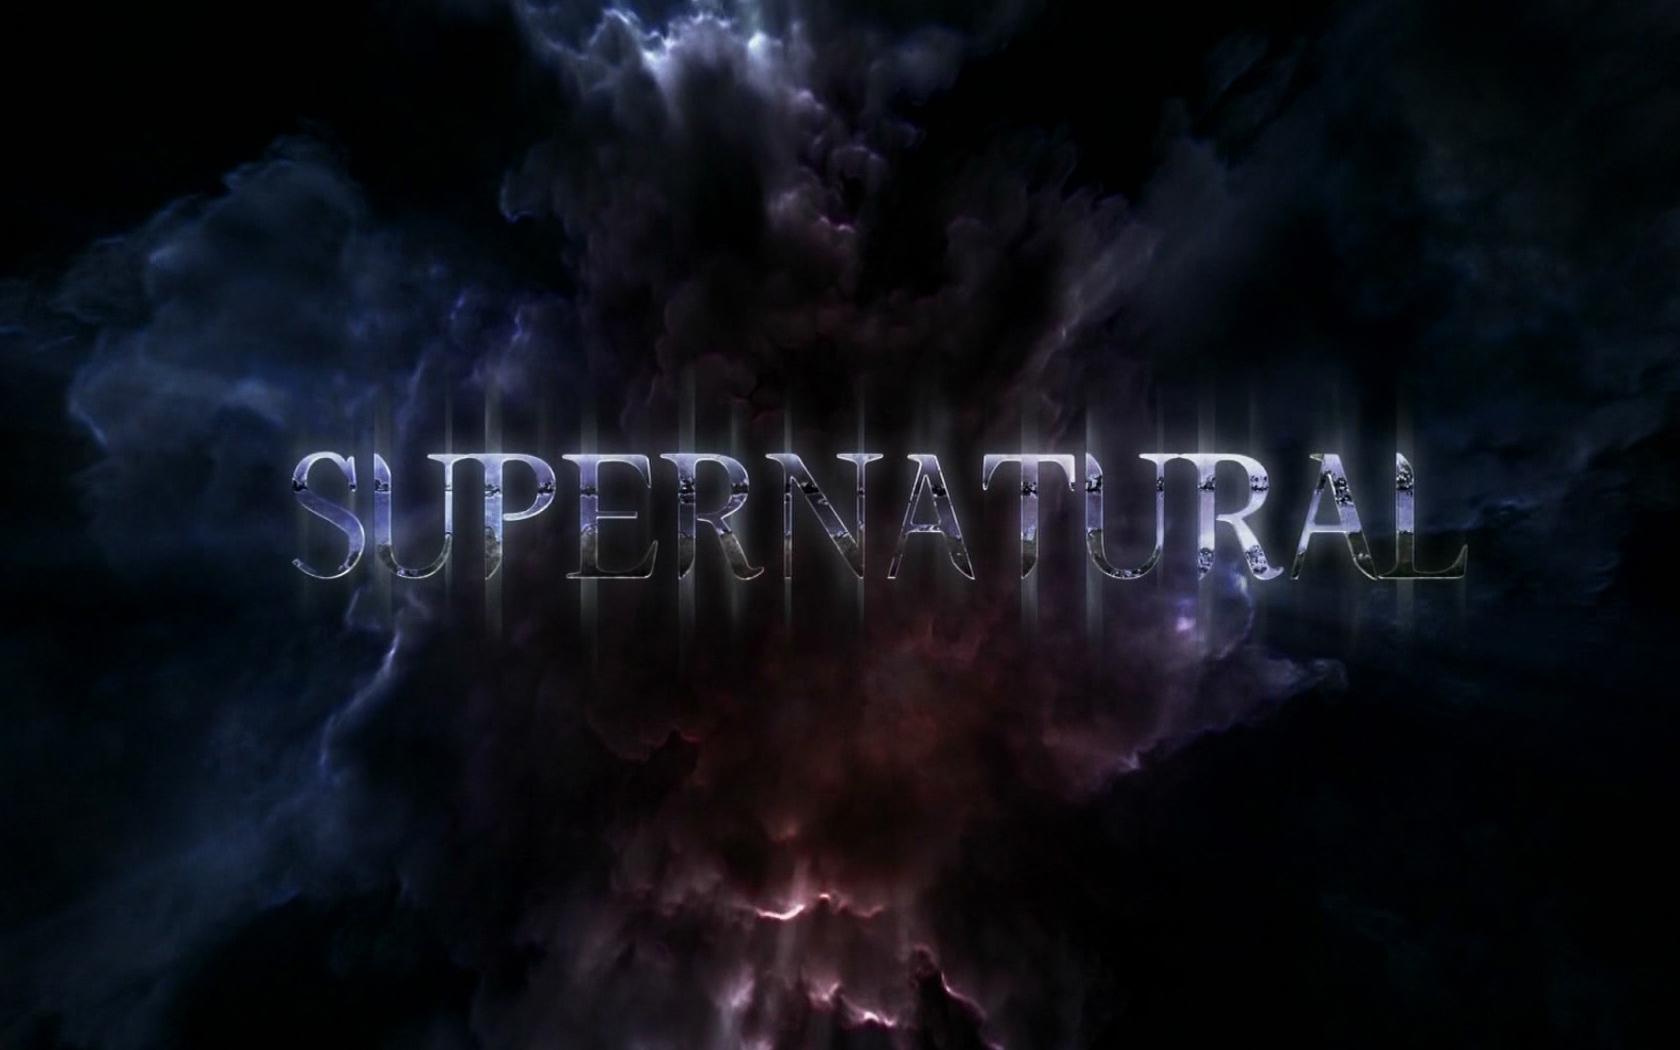 Group Of Impala Supernatural Wallpaper Download